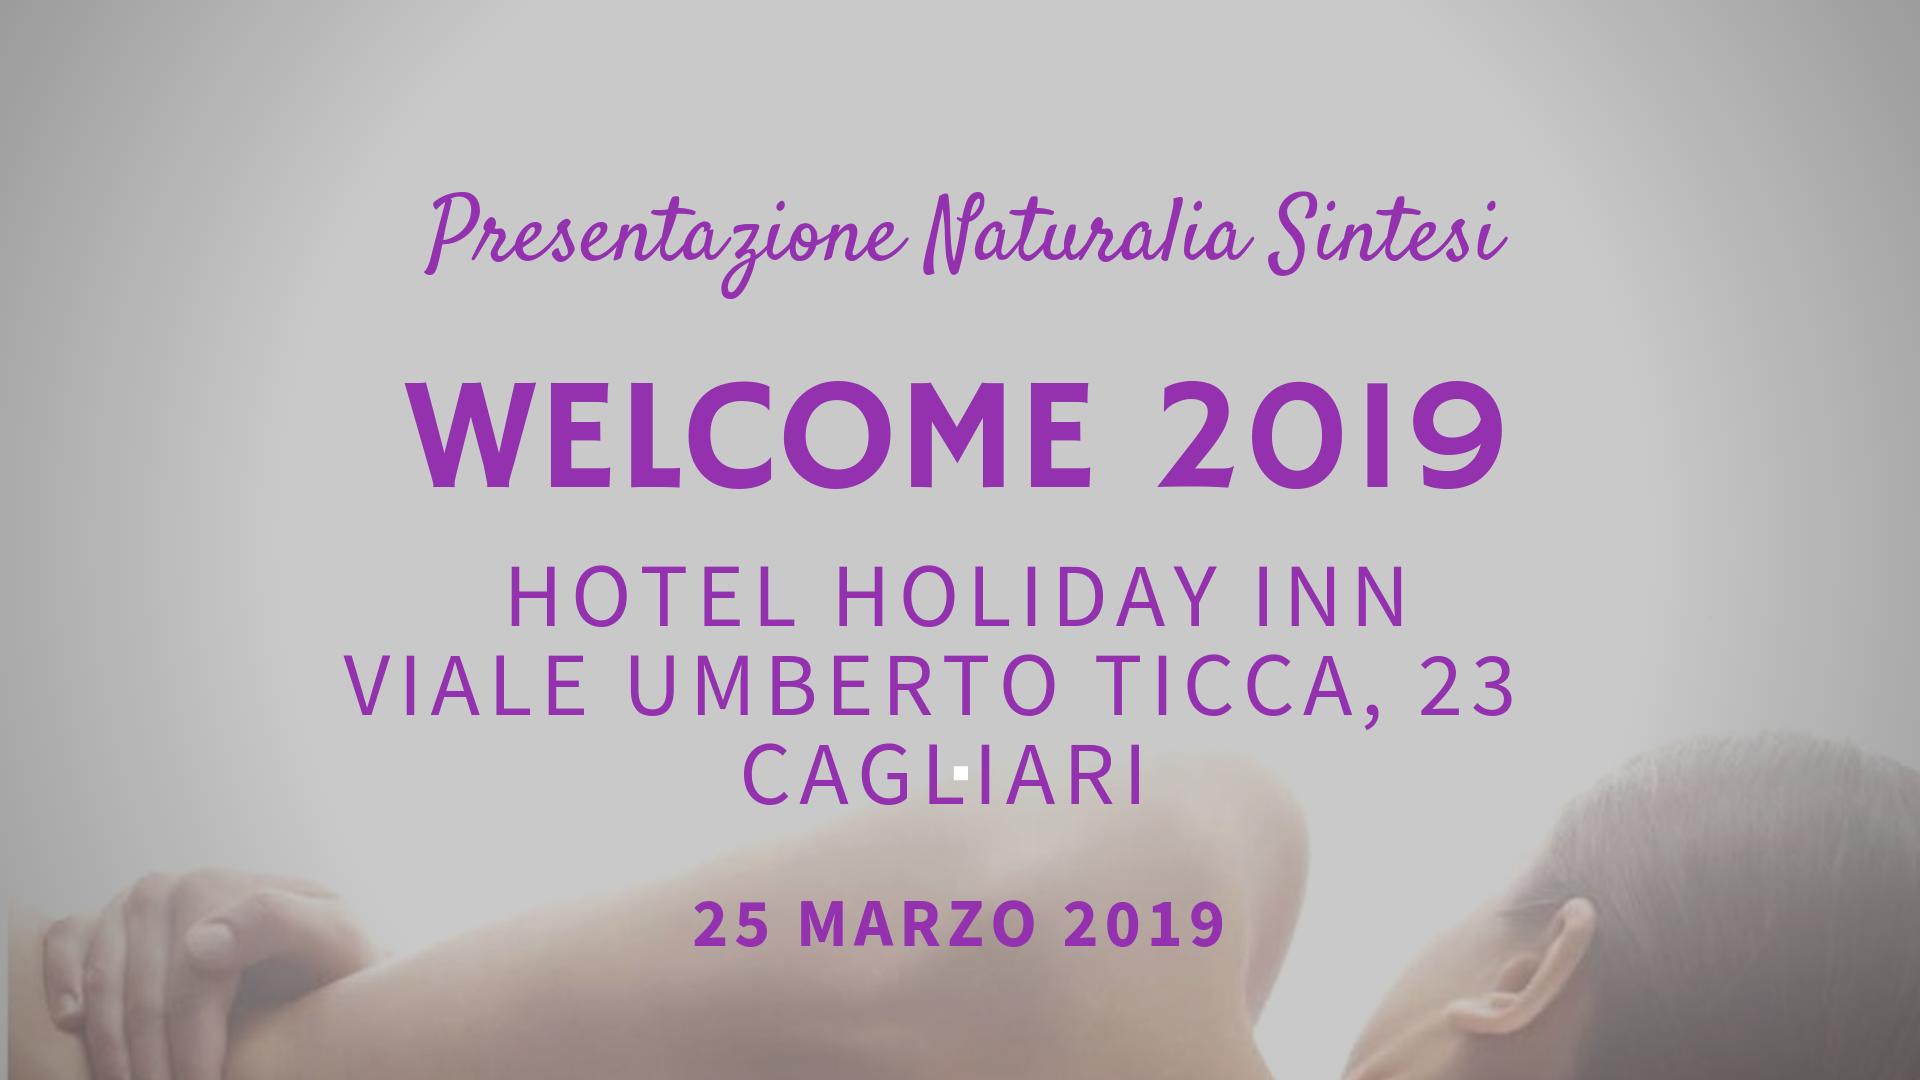 Naturalia Sintesi – Welcome 2019, Cagliari